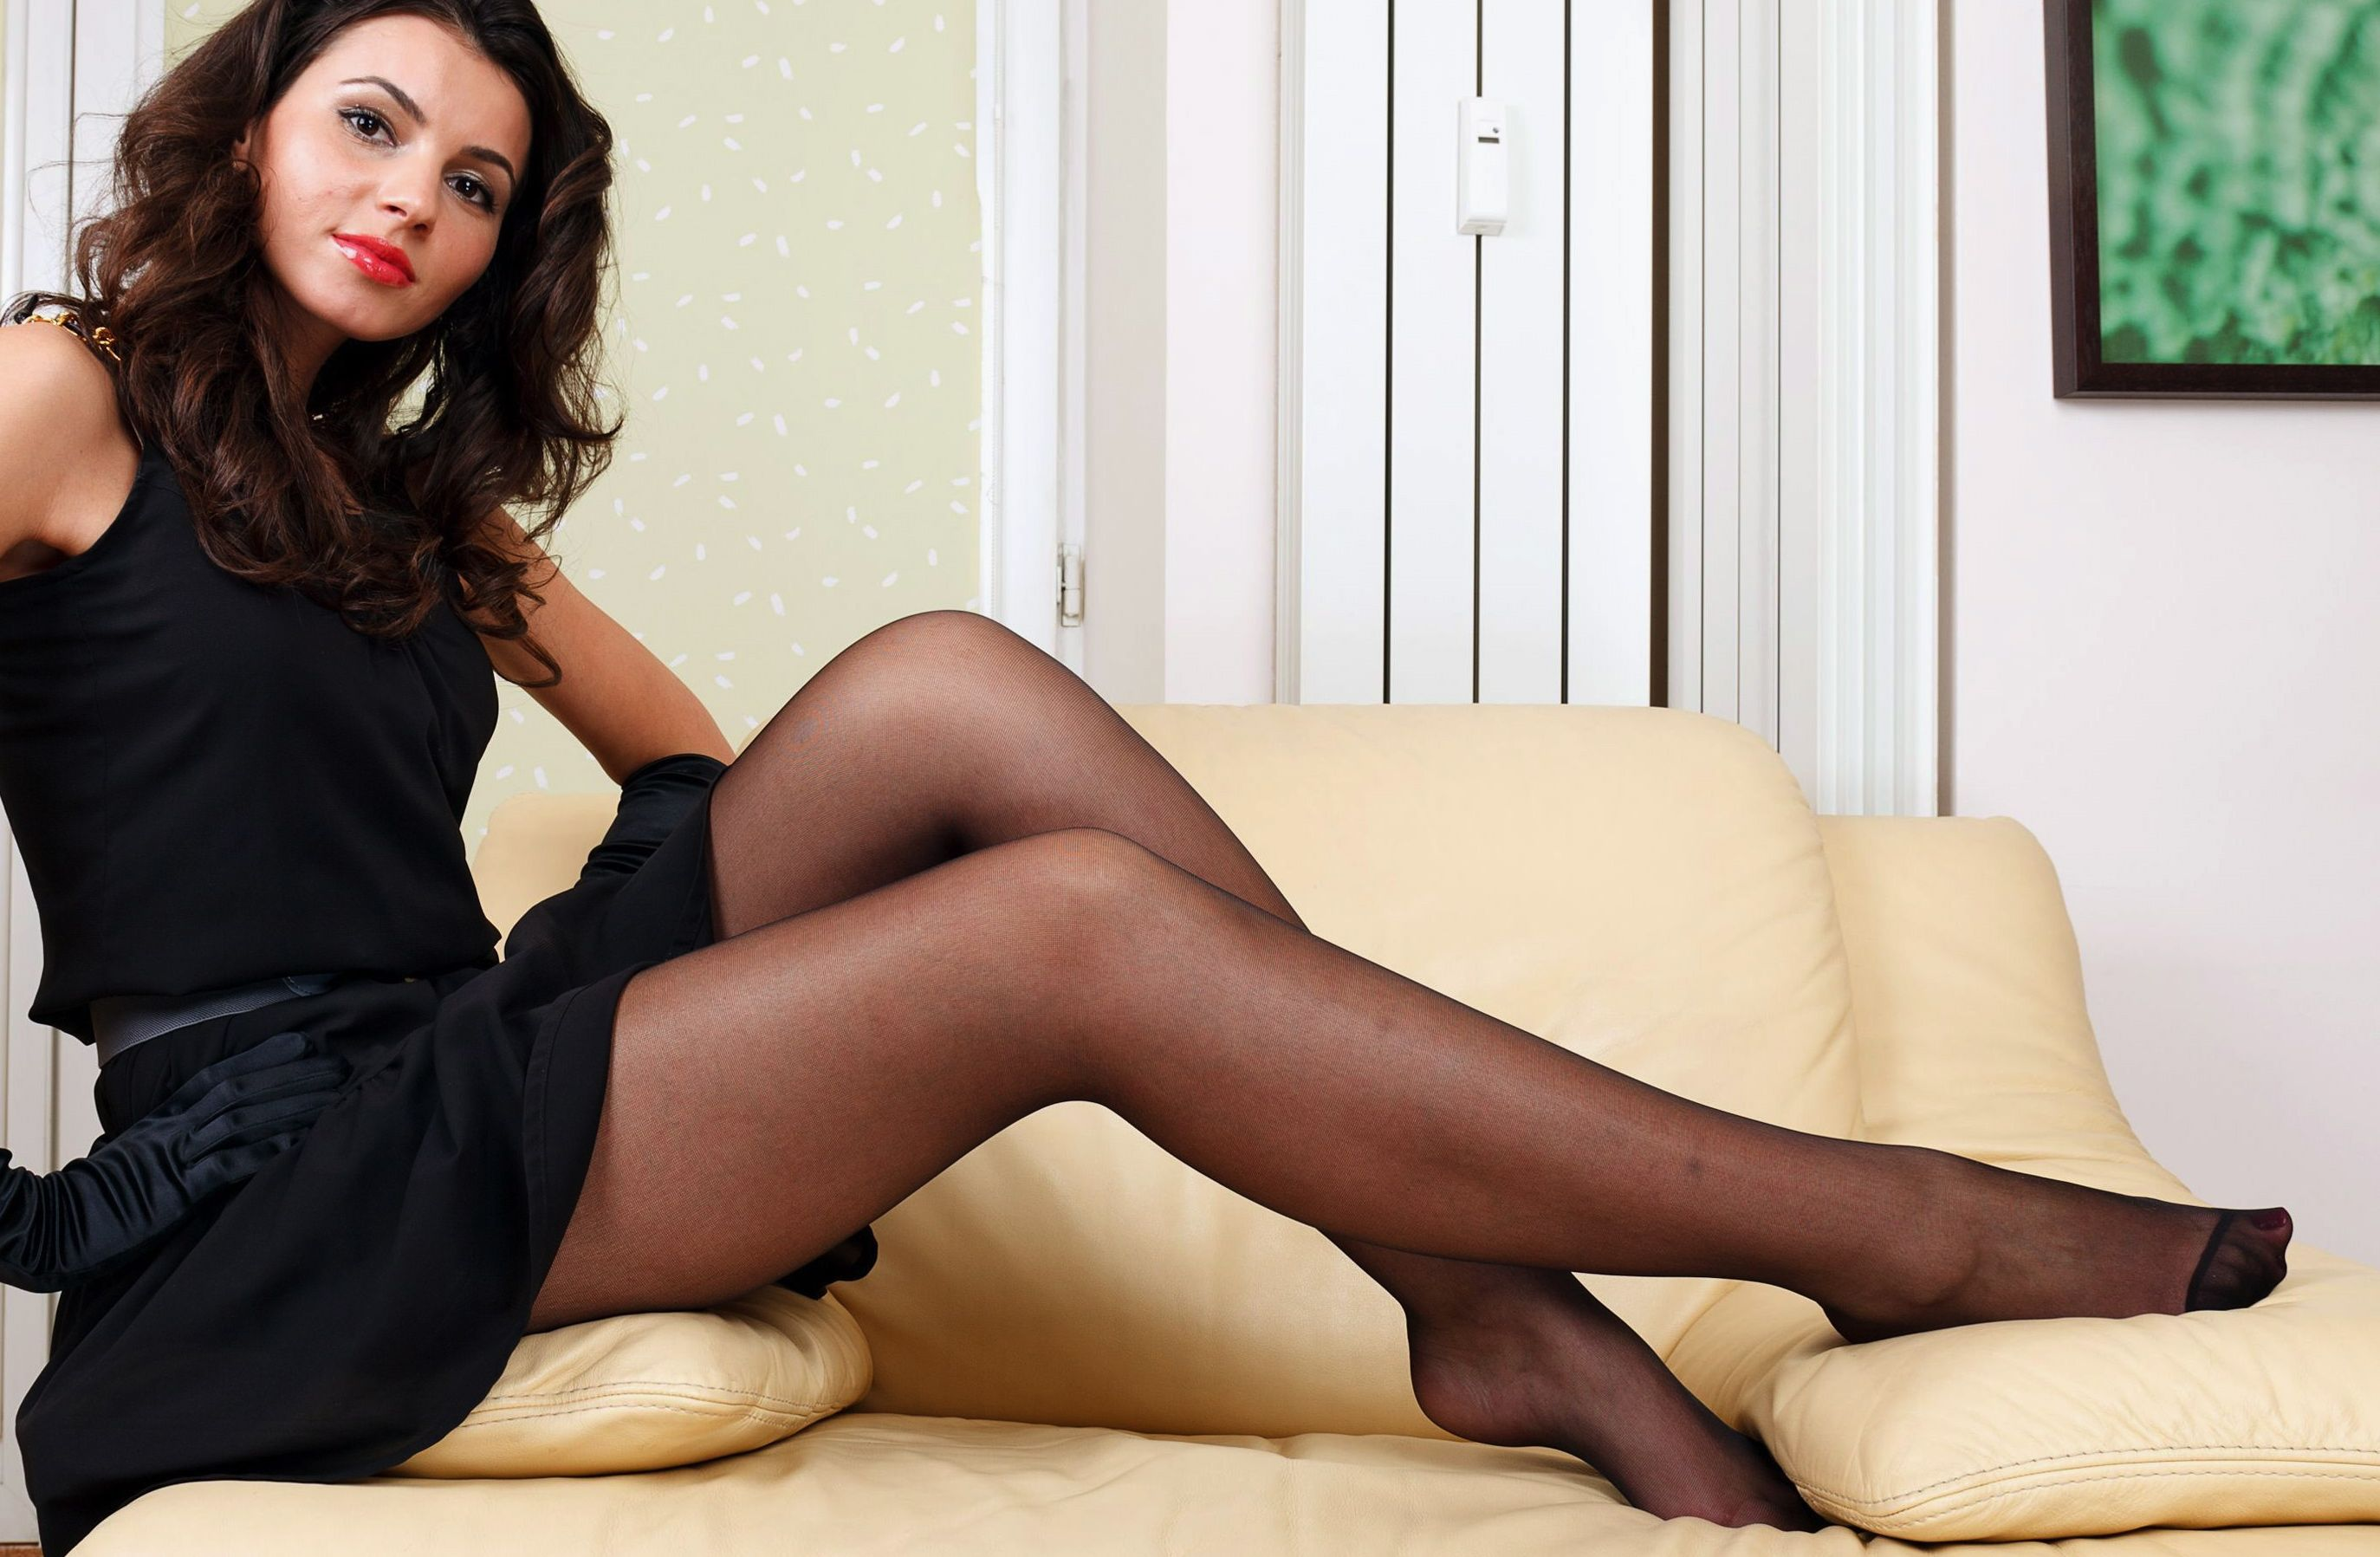 high Sheer heels and pantyhose